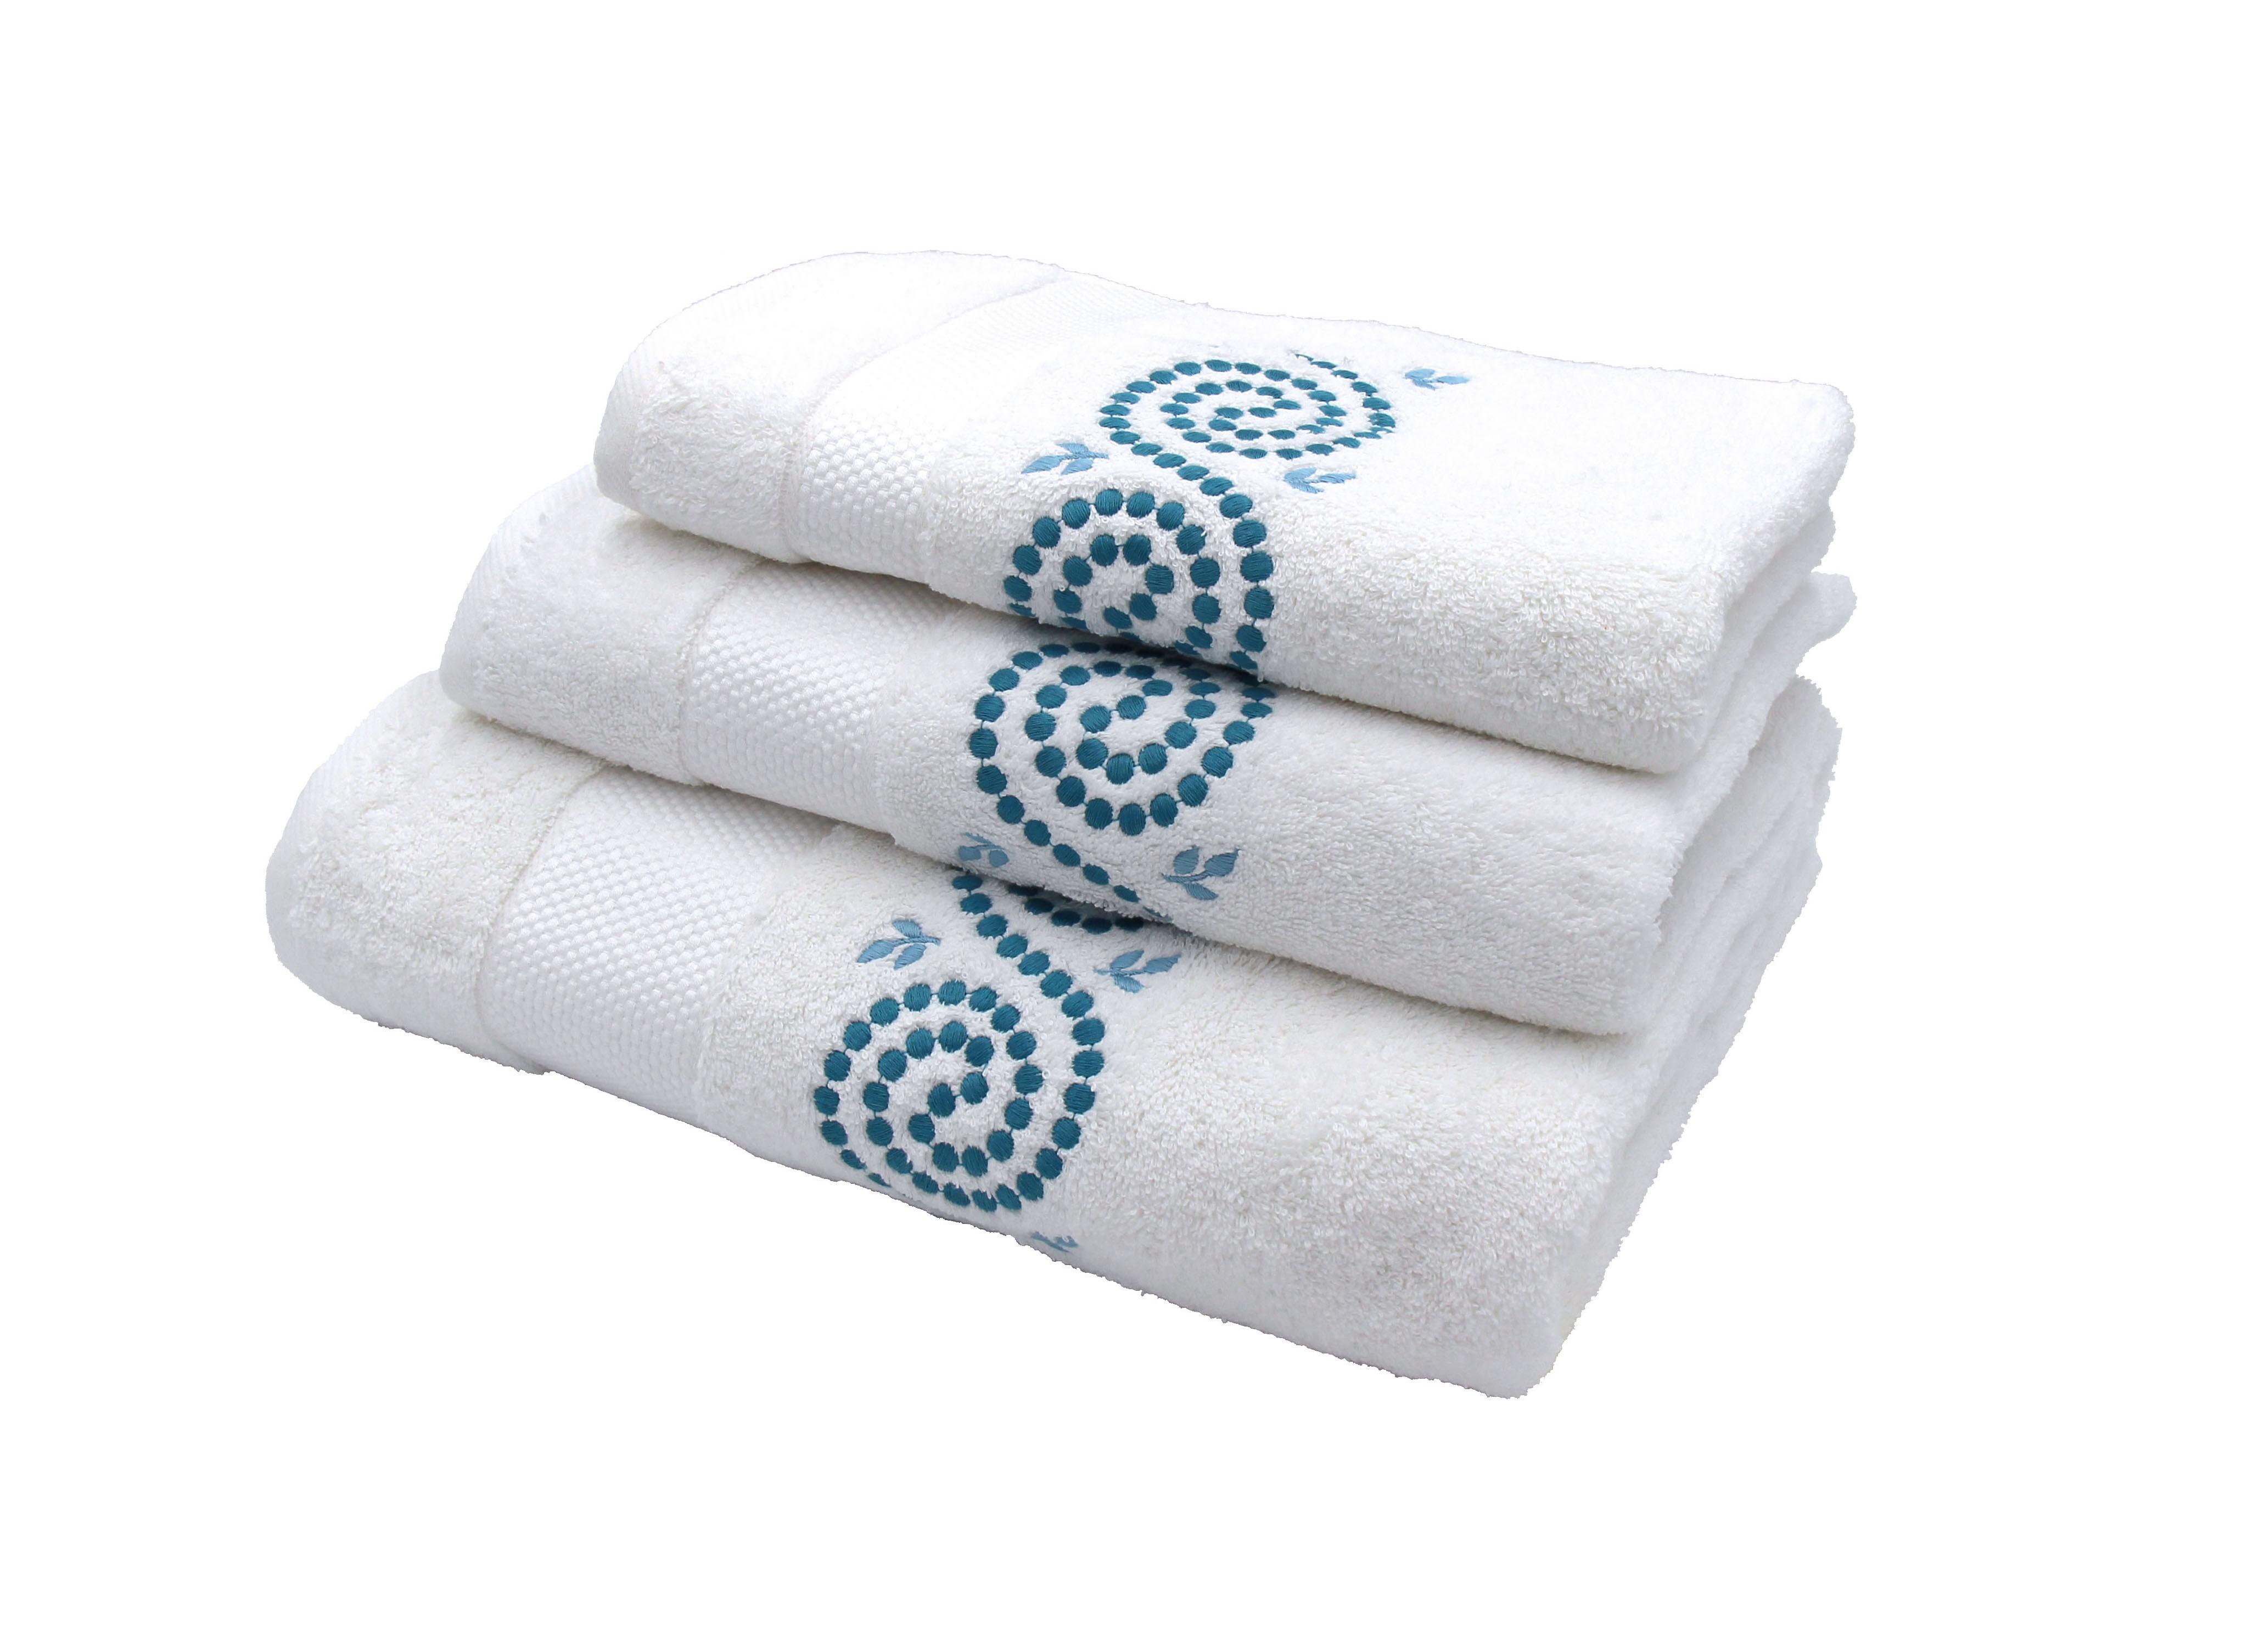 """Sultane"" bath towels"